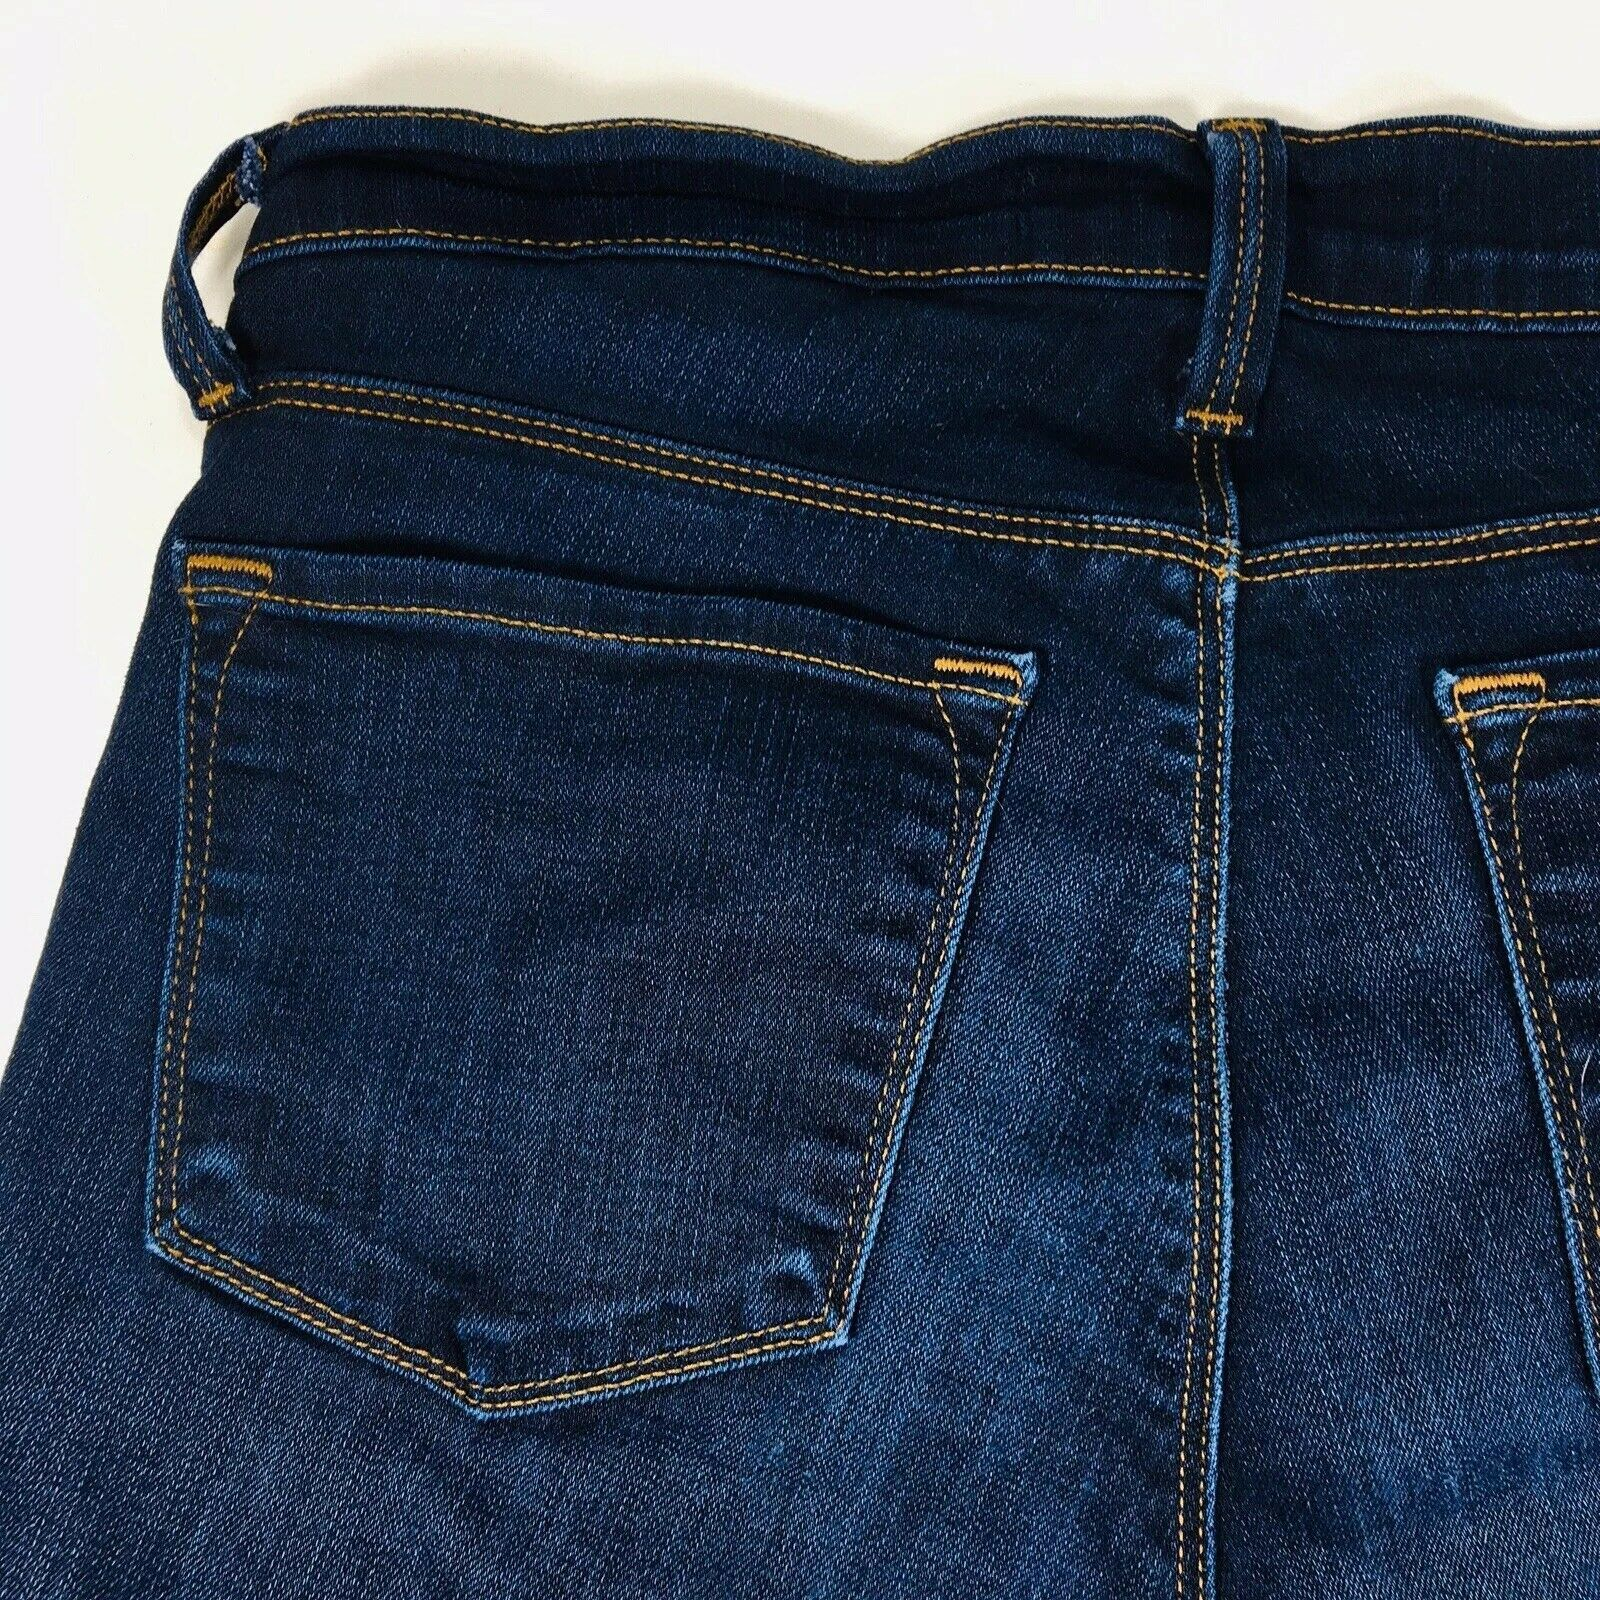 J Brand Womens Cigarette Leg Ignite Slim Straight Leg Cotton Stretch Size 28x31 image 5